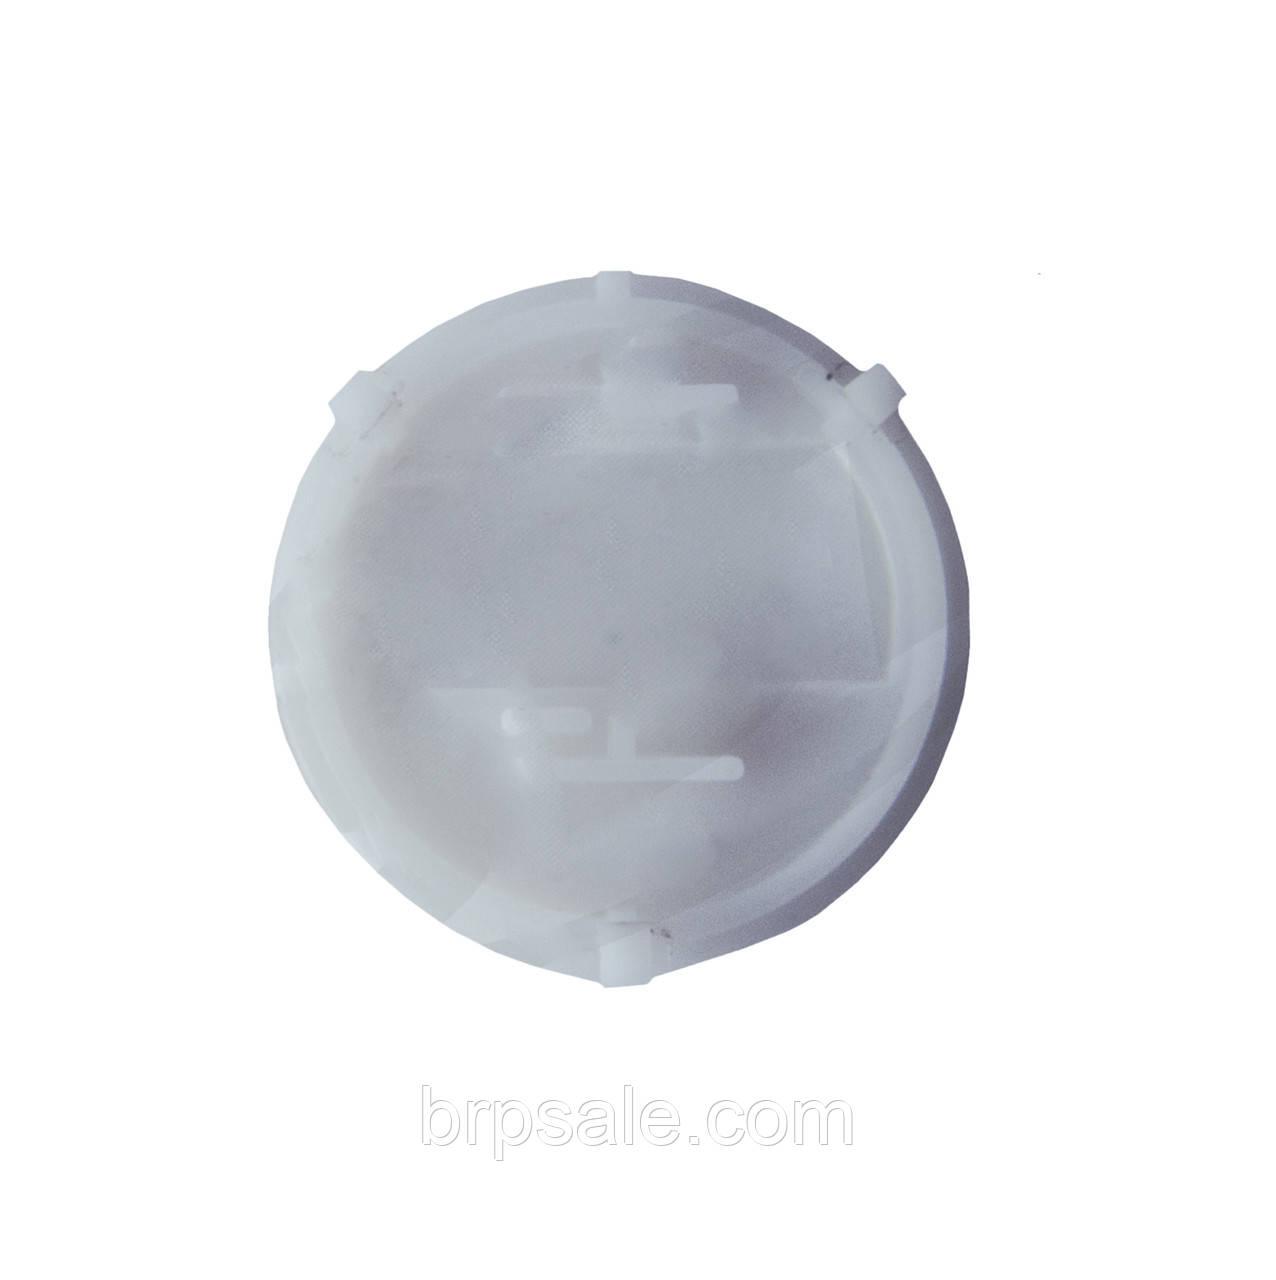 Паливний фільтр Sea-Doo BRP FILTER-FUEL